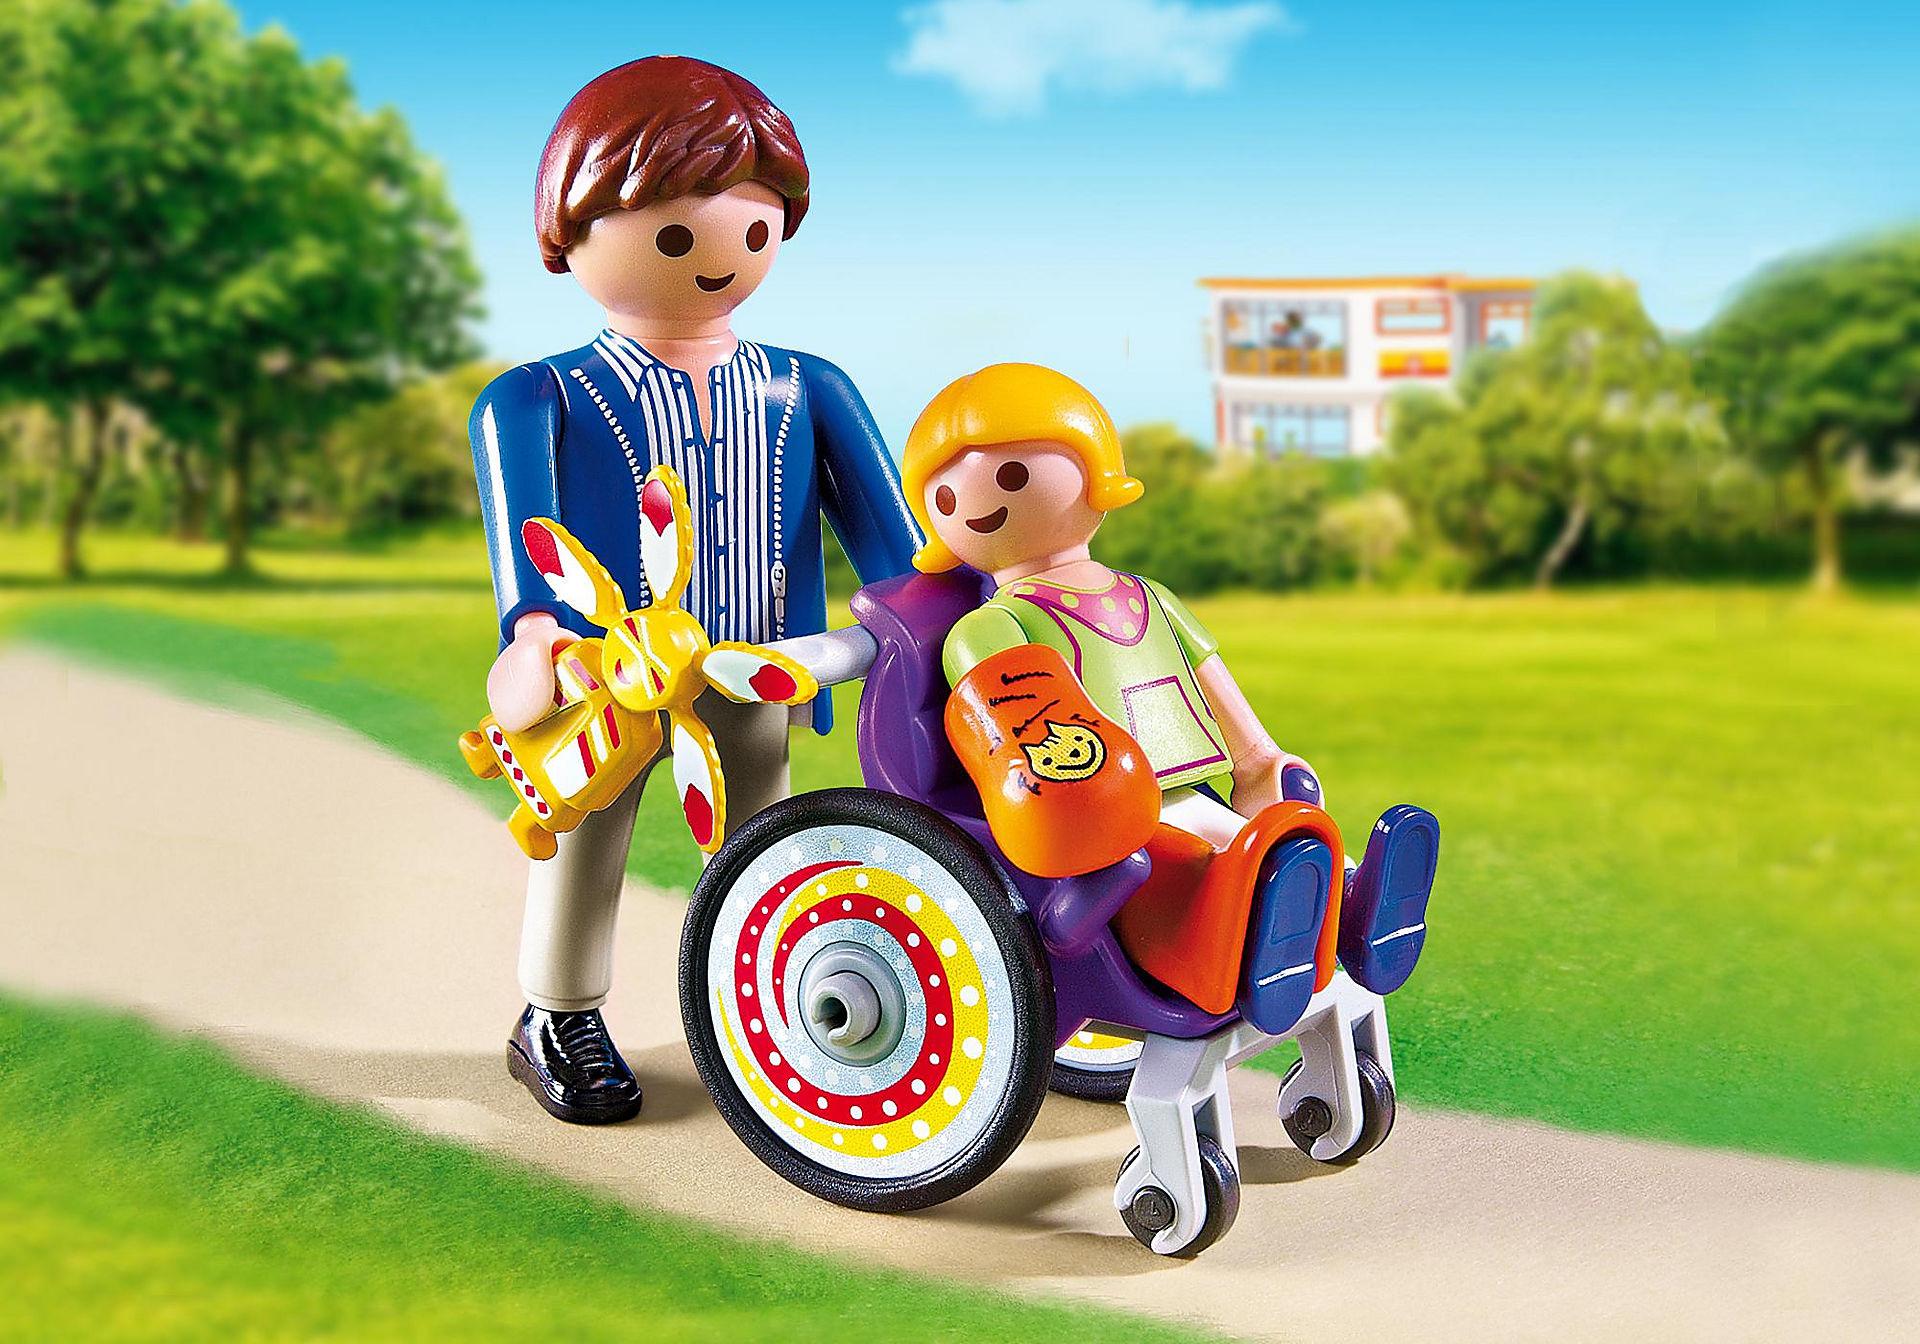 6663 Kind im Rollstuhl zoom image1